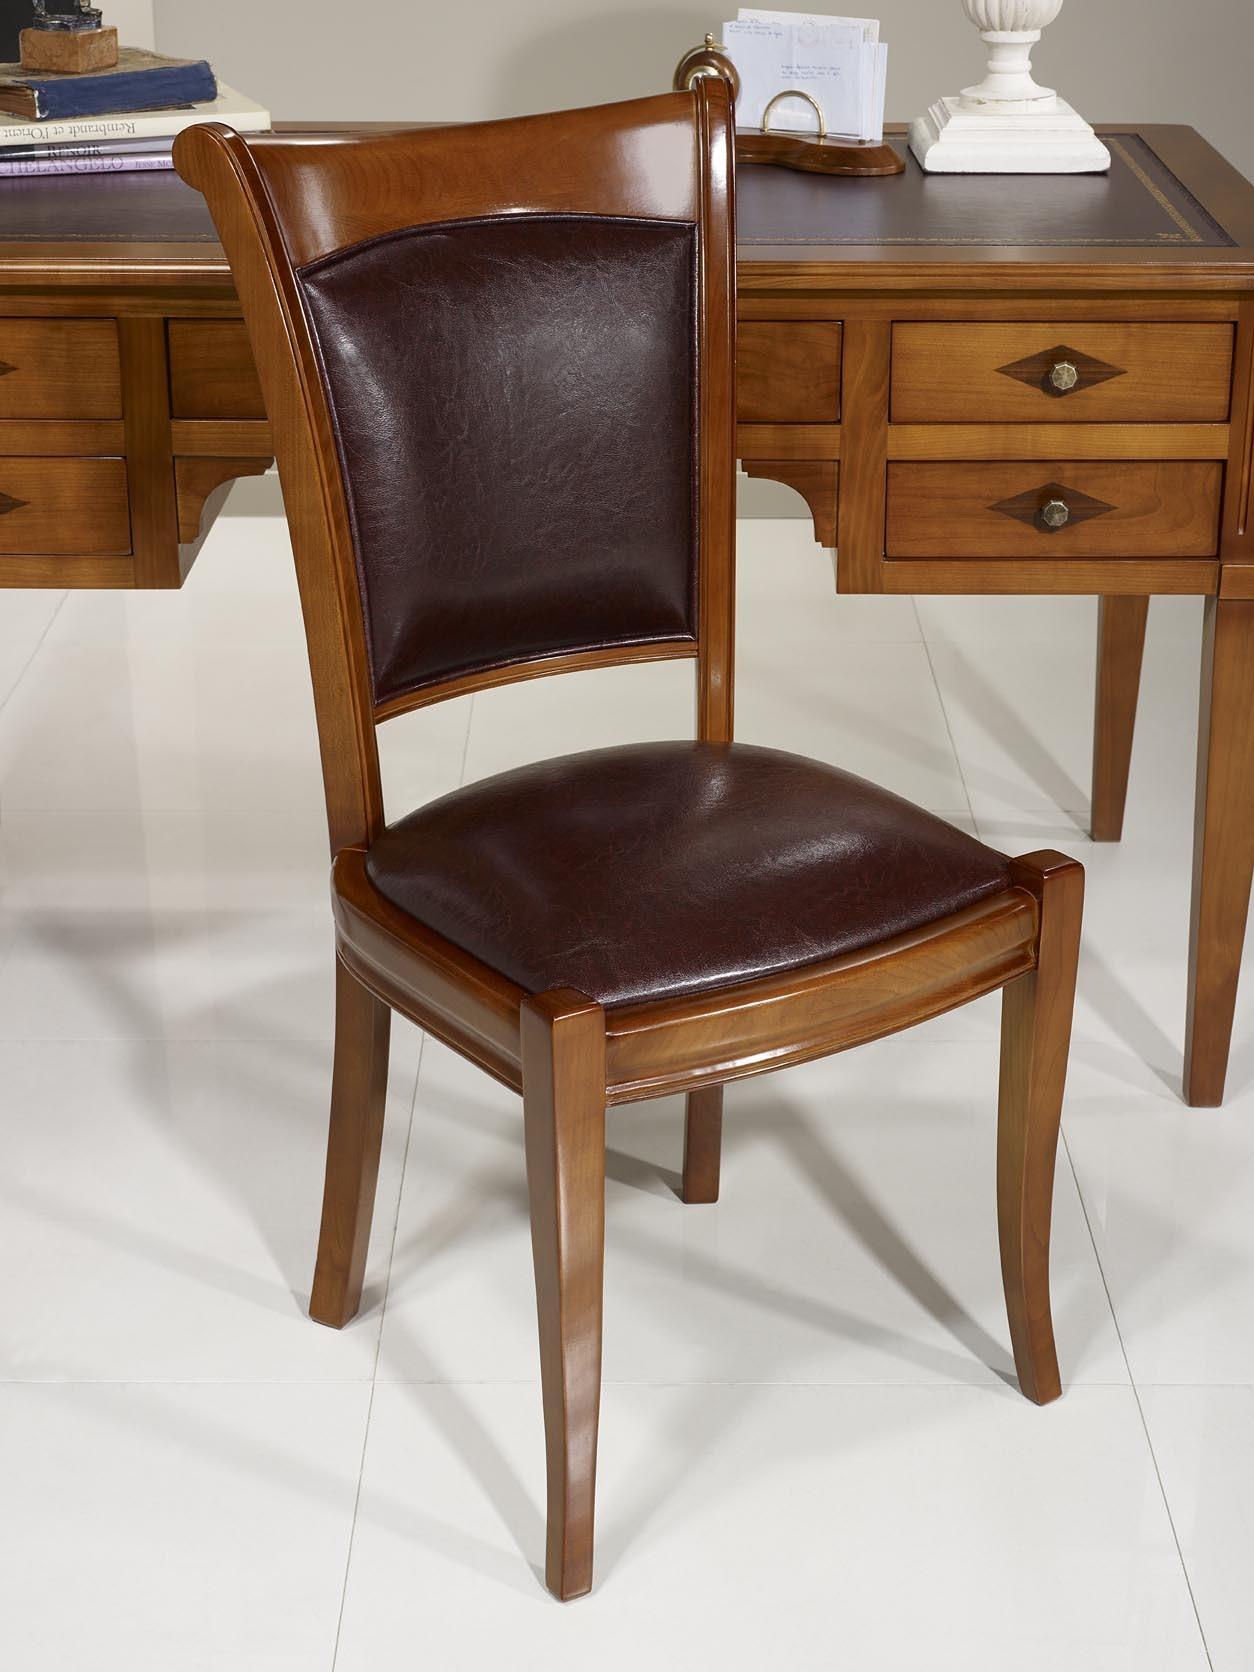 Chaise ine en merisier massif de style louis philippe for Chaise meuble